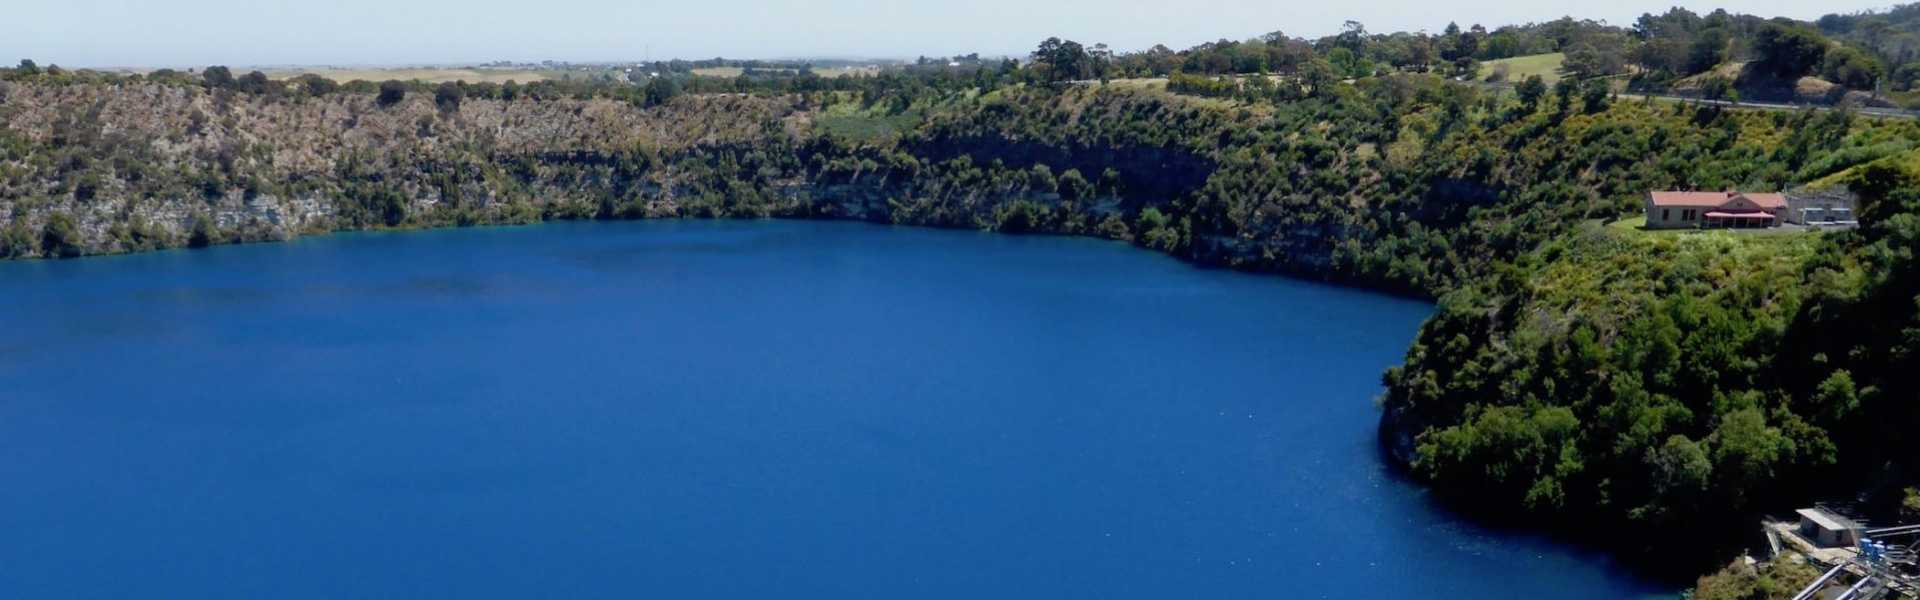 Kui Parks, Mount Gambier Central Caravan Park, Blue Lake